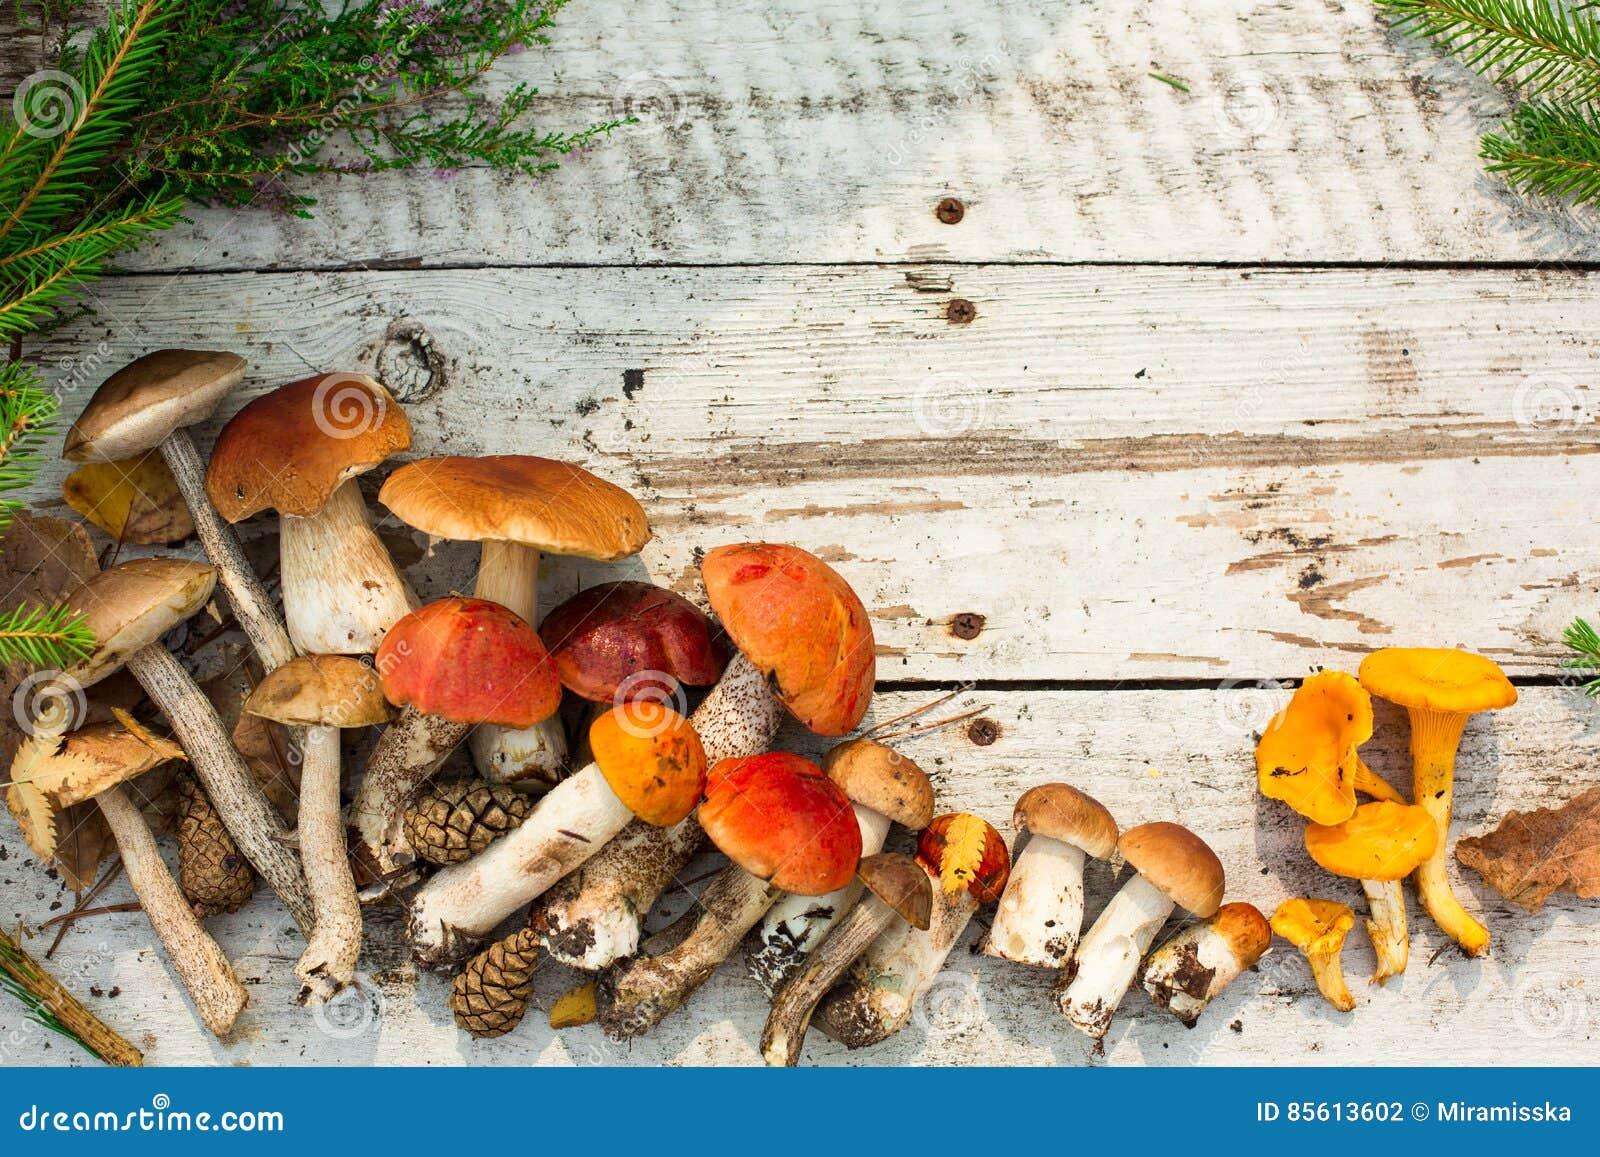 Paddestoelen in boskaart op de herfst of zomer Bosoogstboleet, esp, cantharellen, bladeren, knoppen, bessen, Hoogste mening